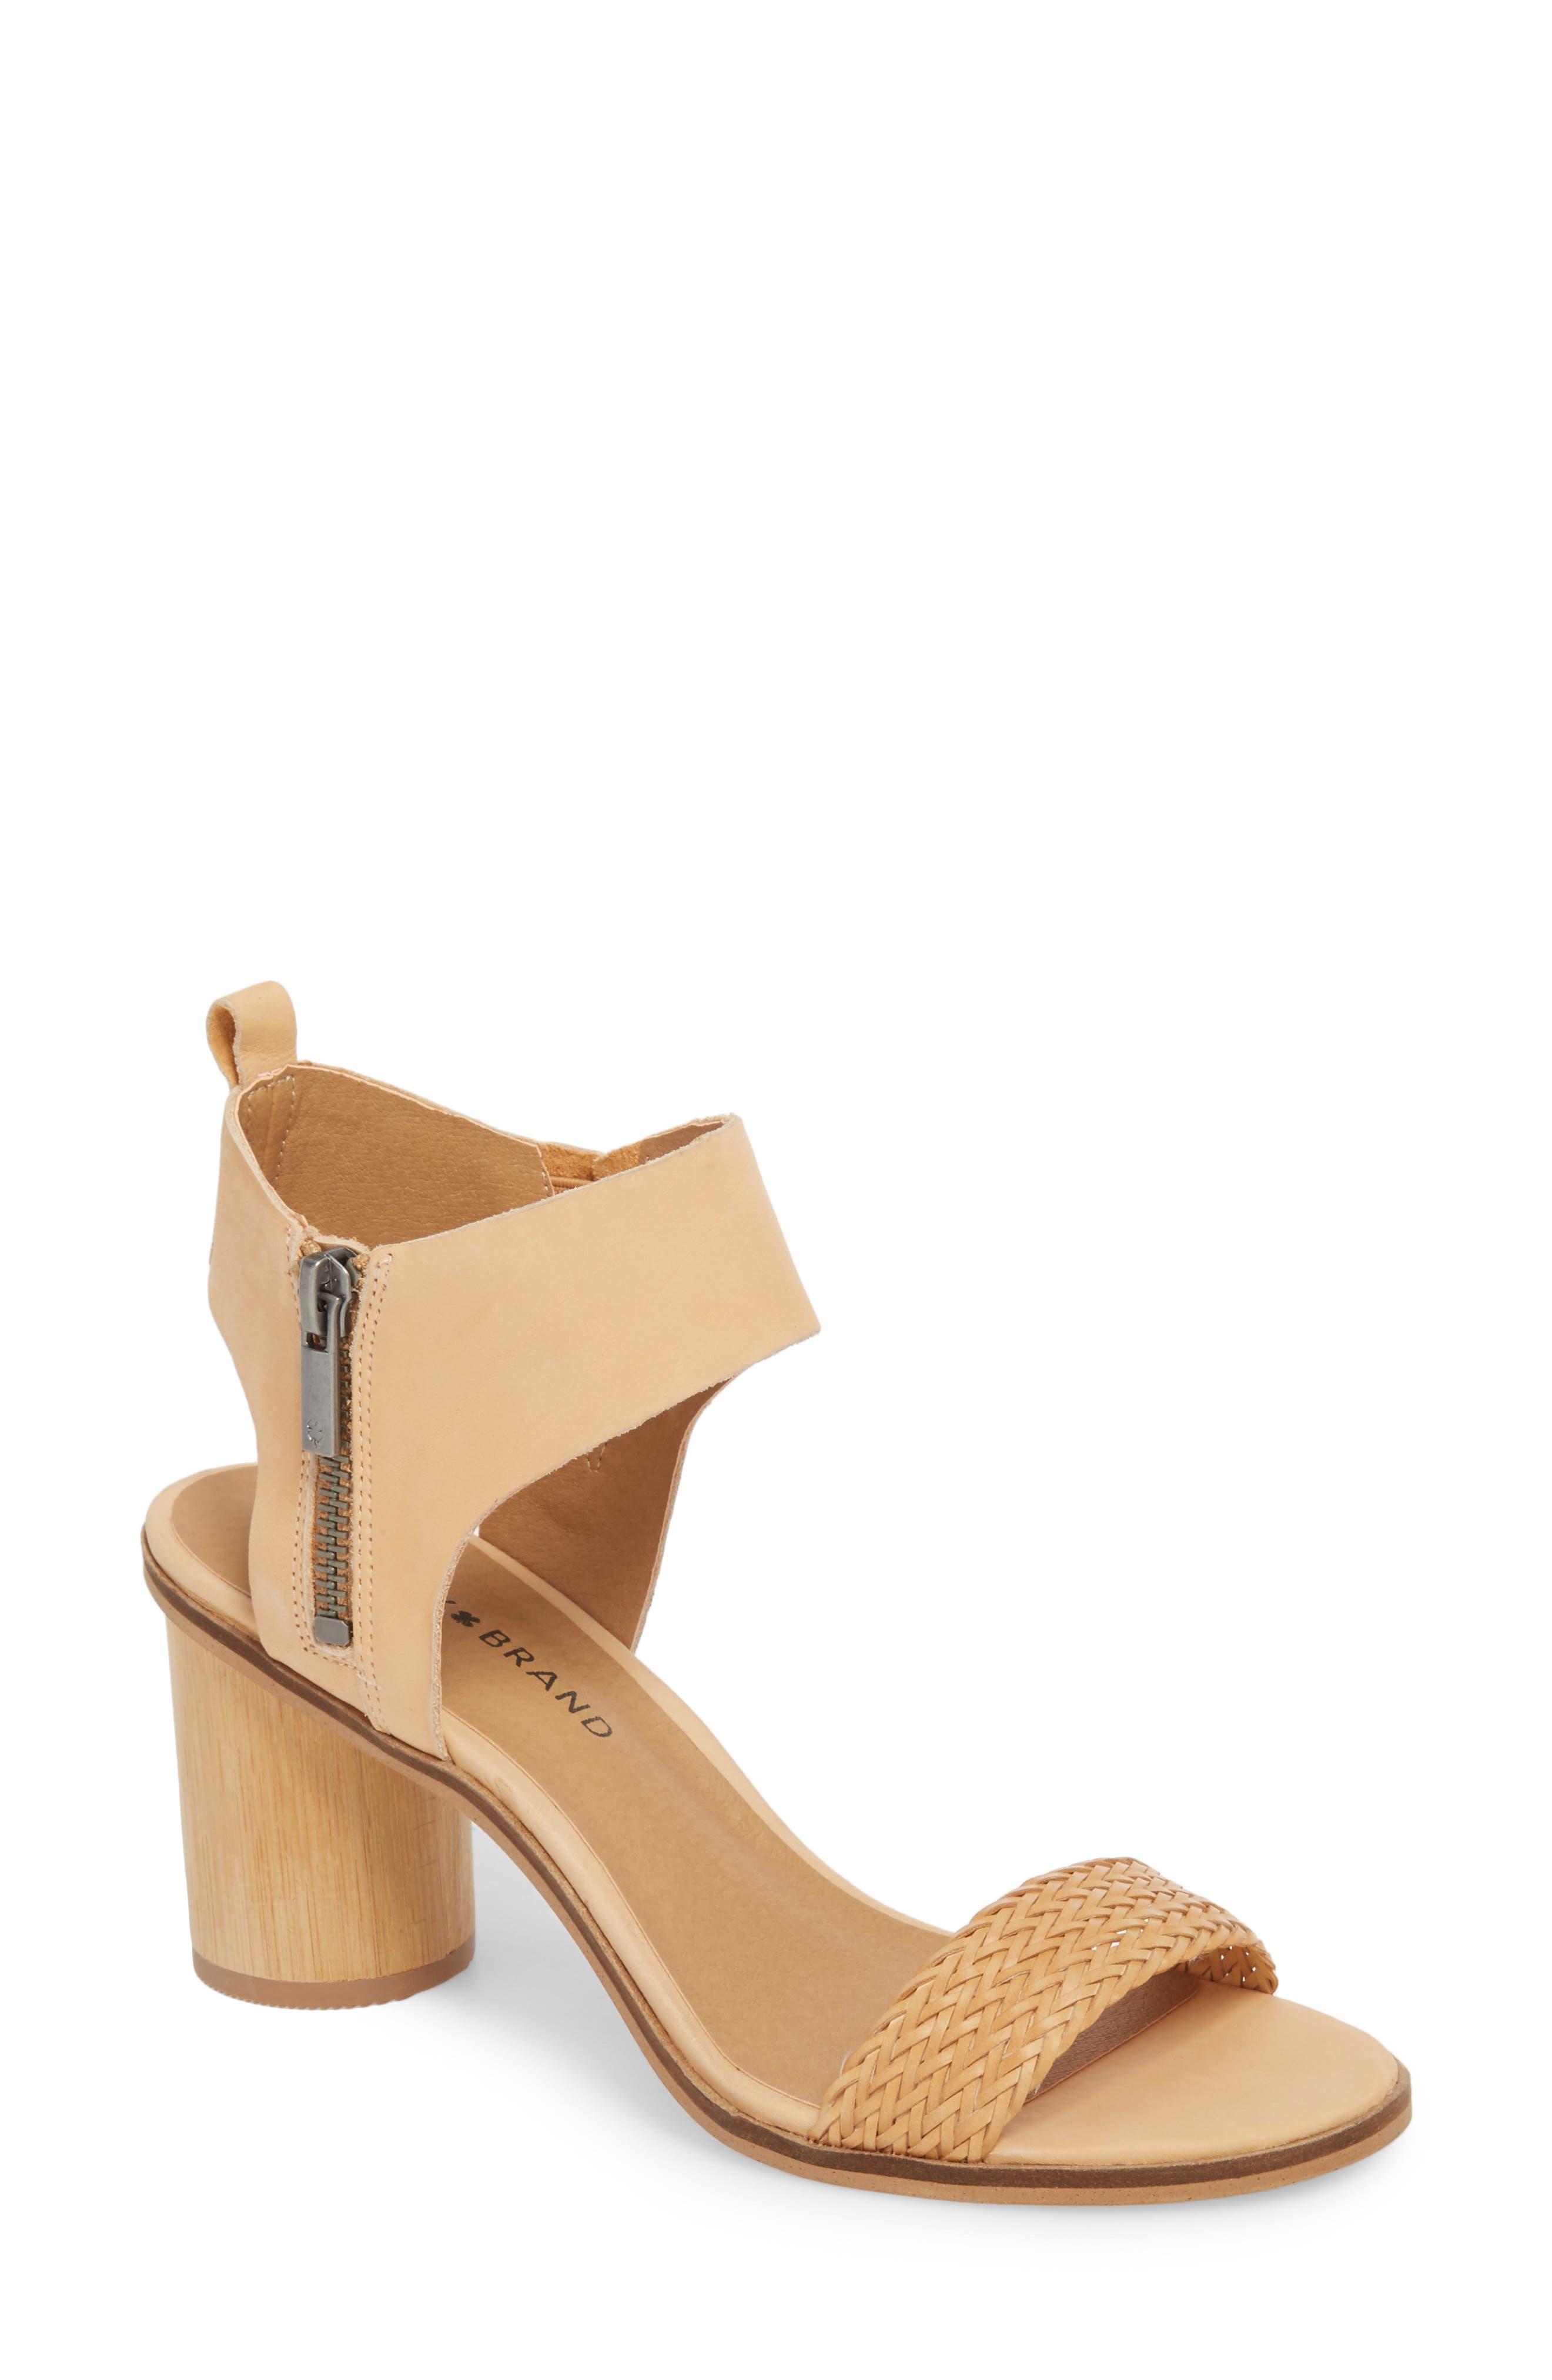 Pomee Sandal,                         Main,                         color, Sandy Leather